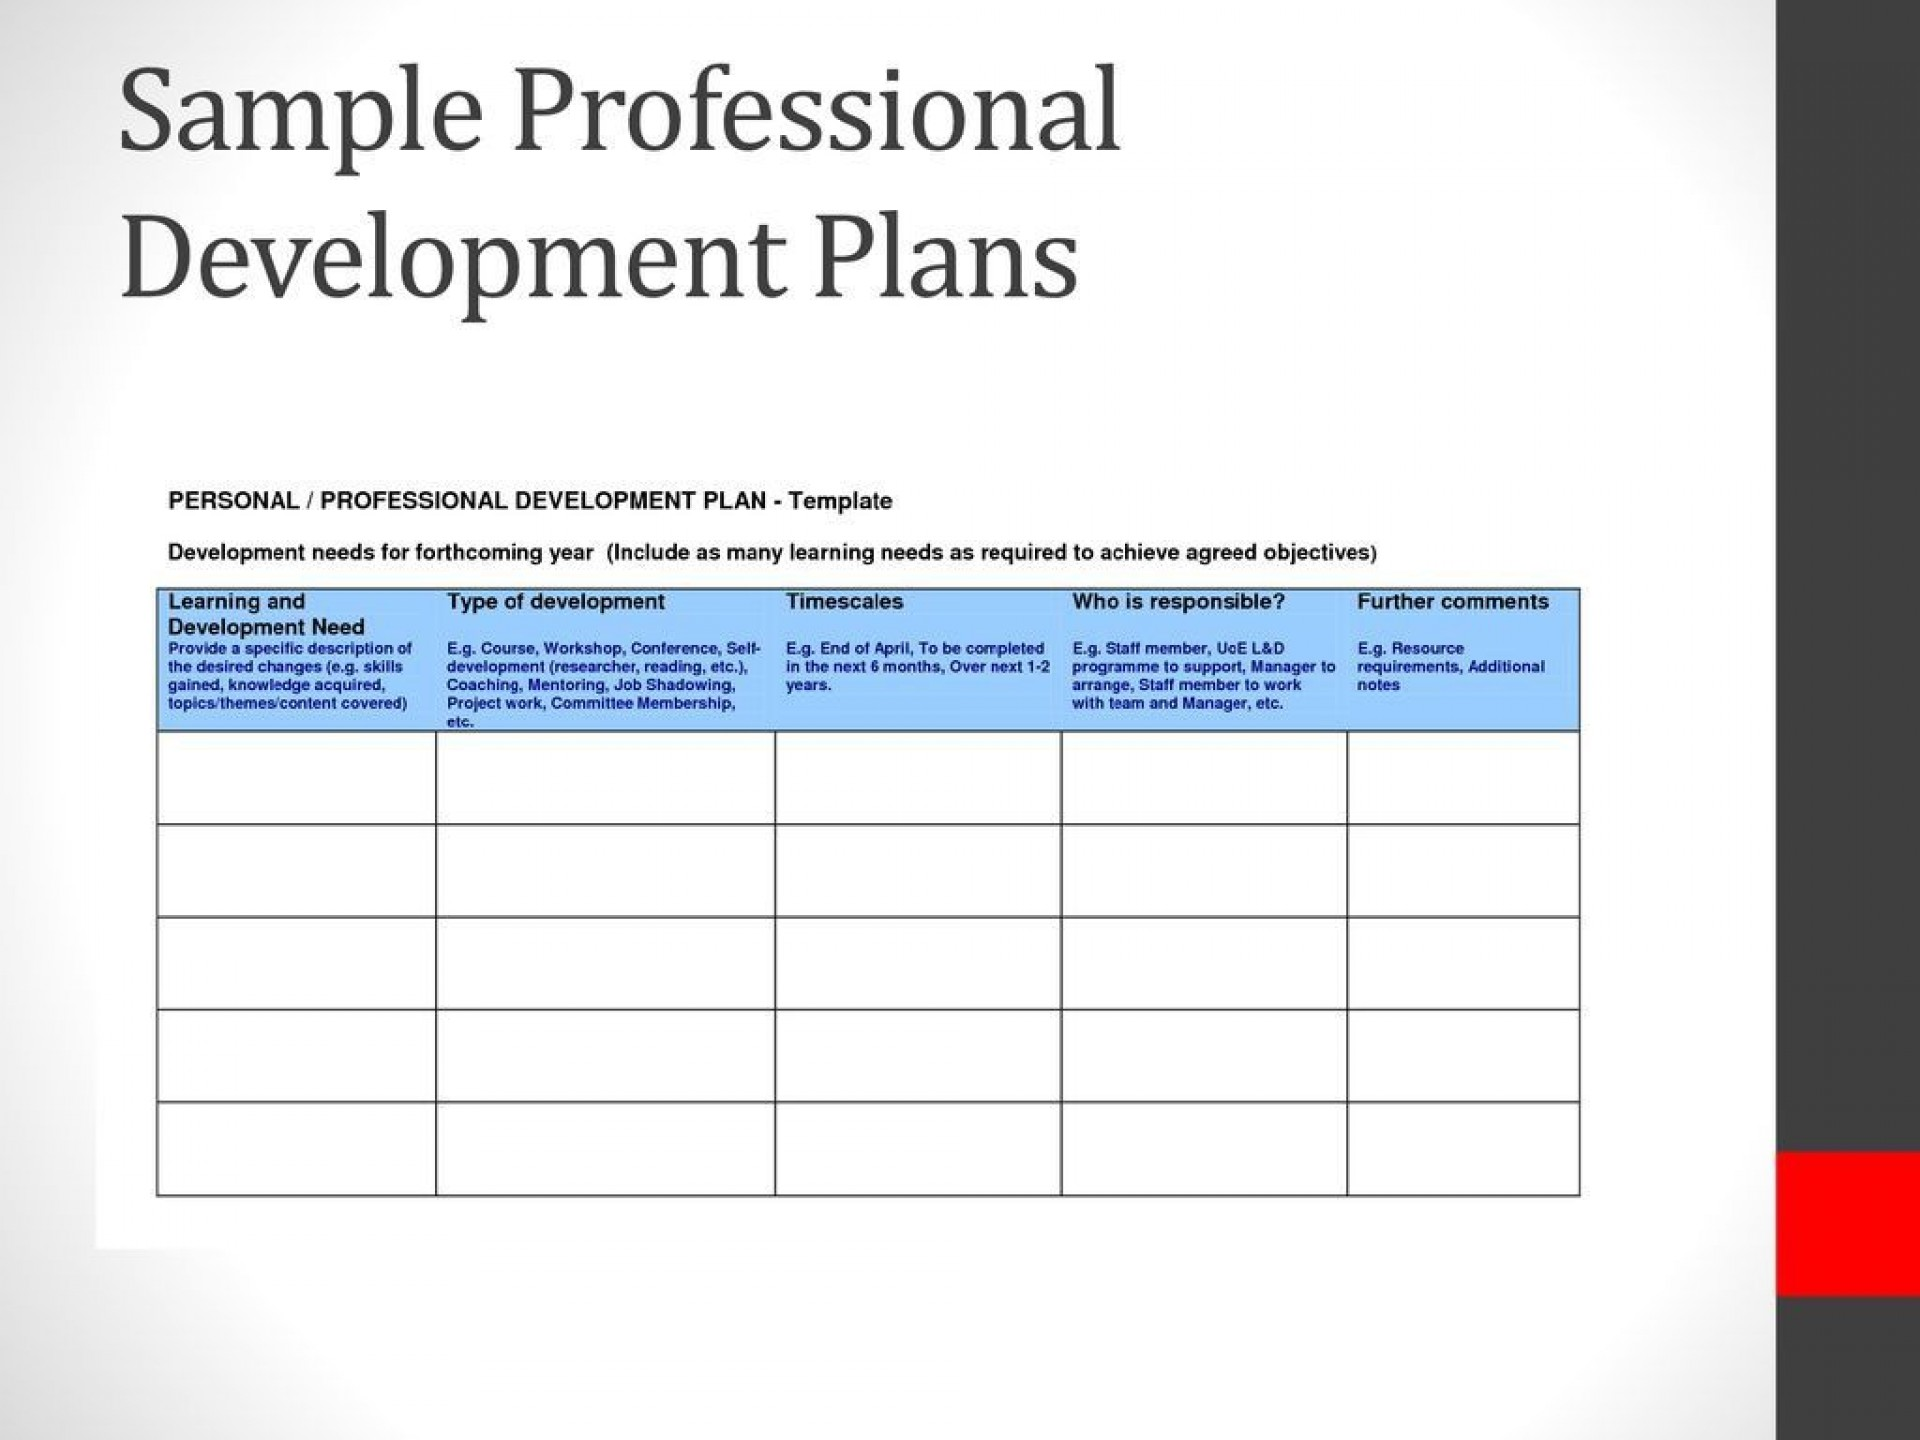 007 Frightening Professional Development Plan Template For Employee Idea  Example Sample1920